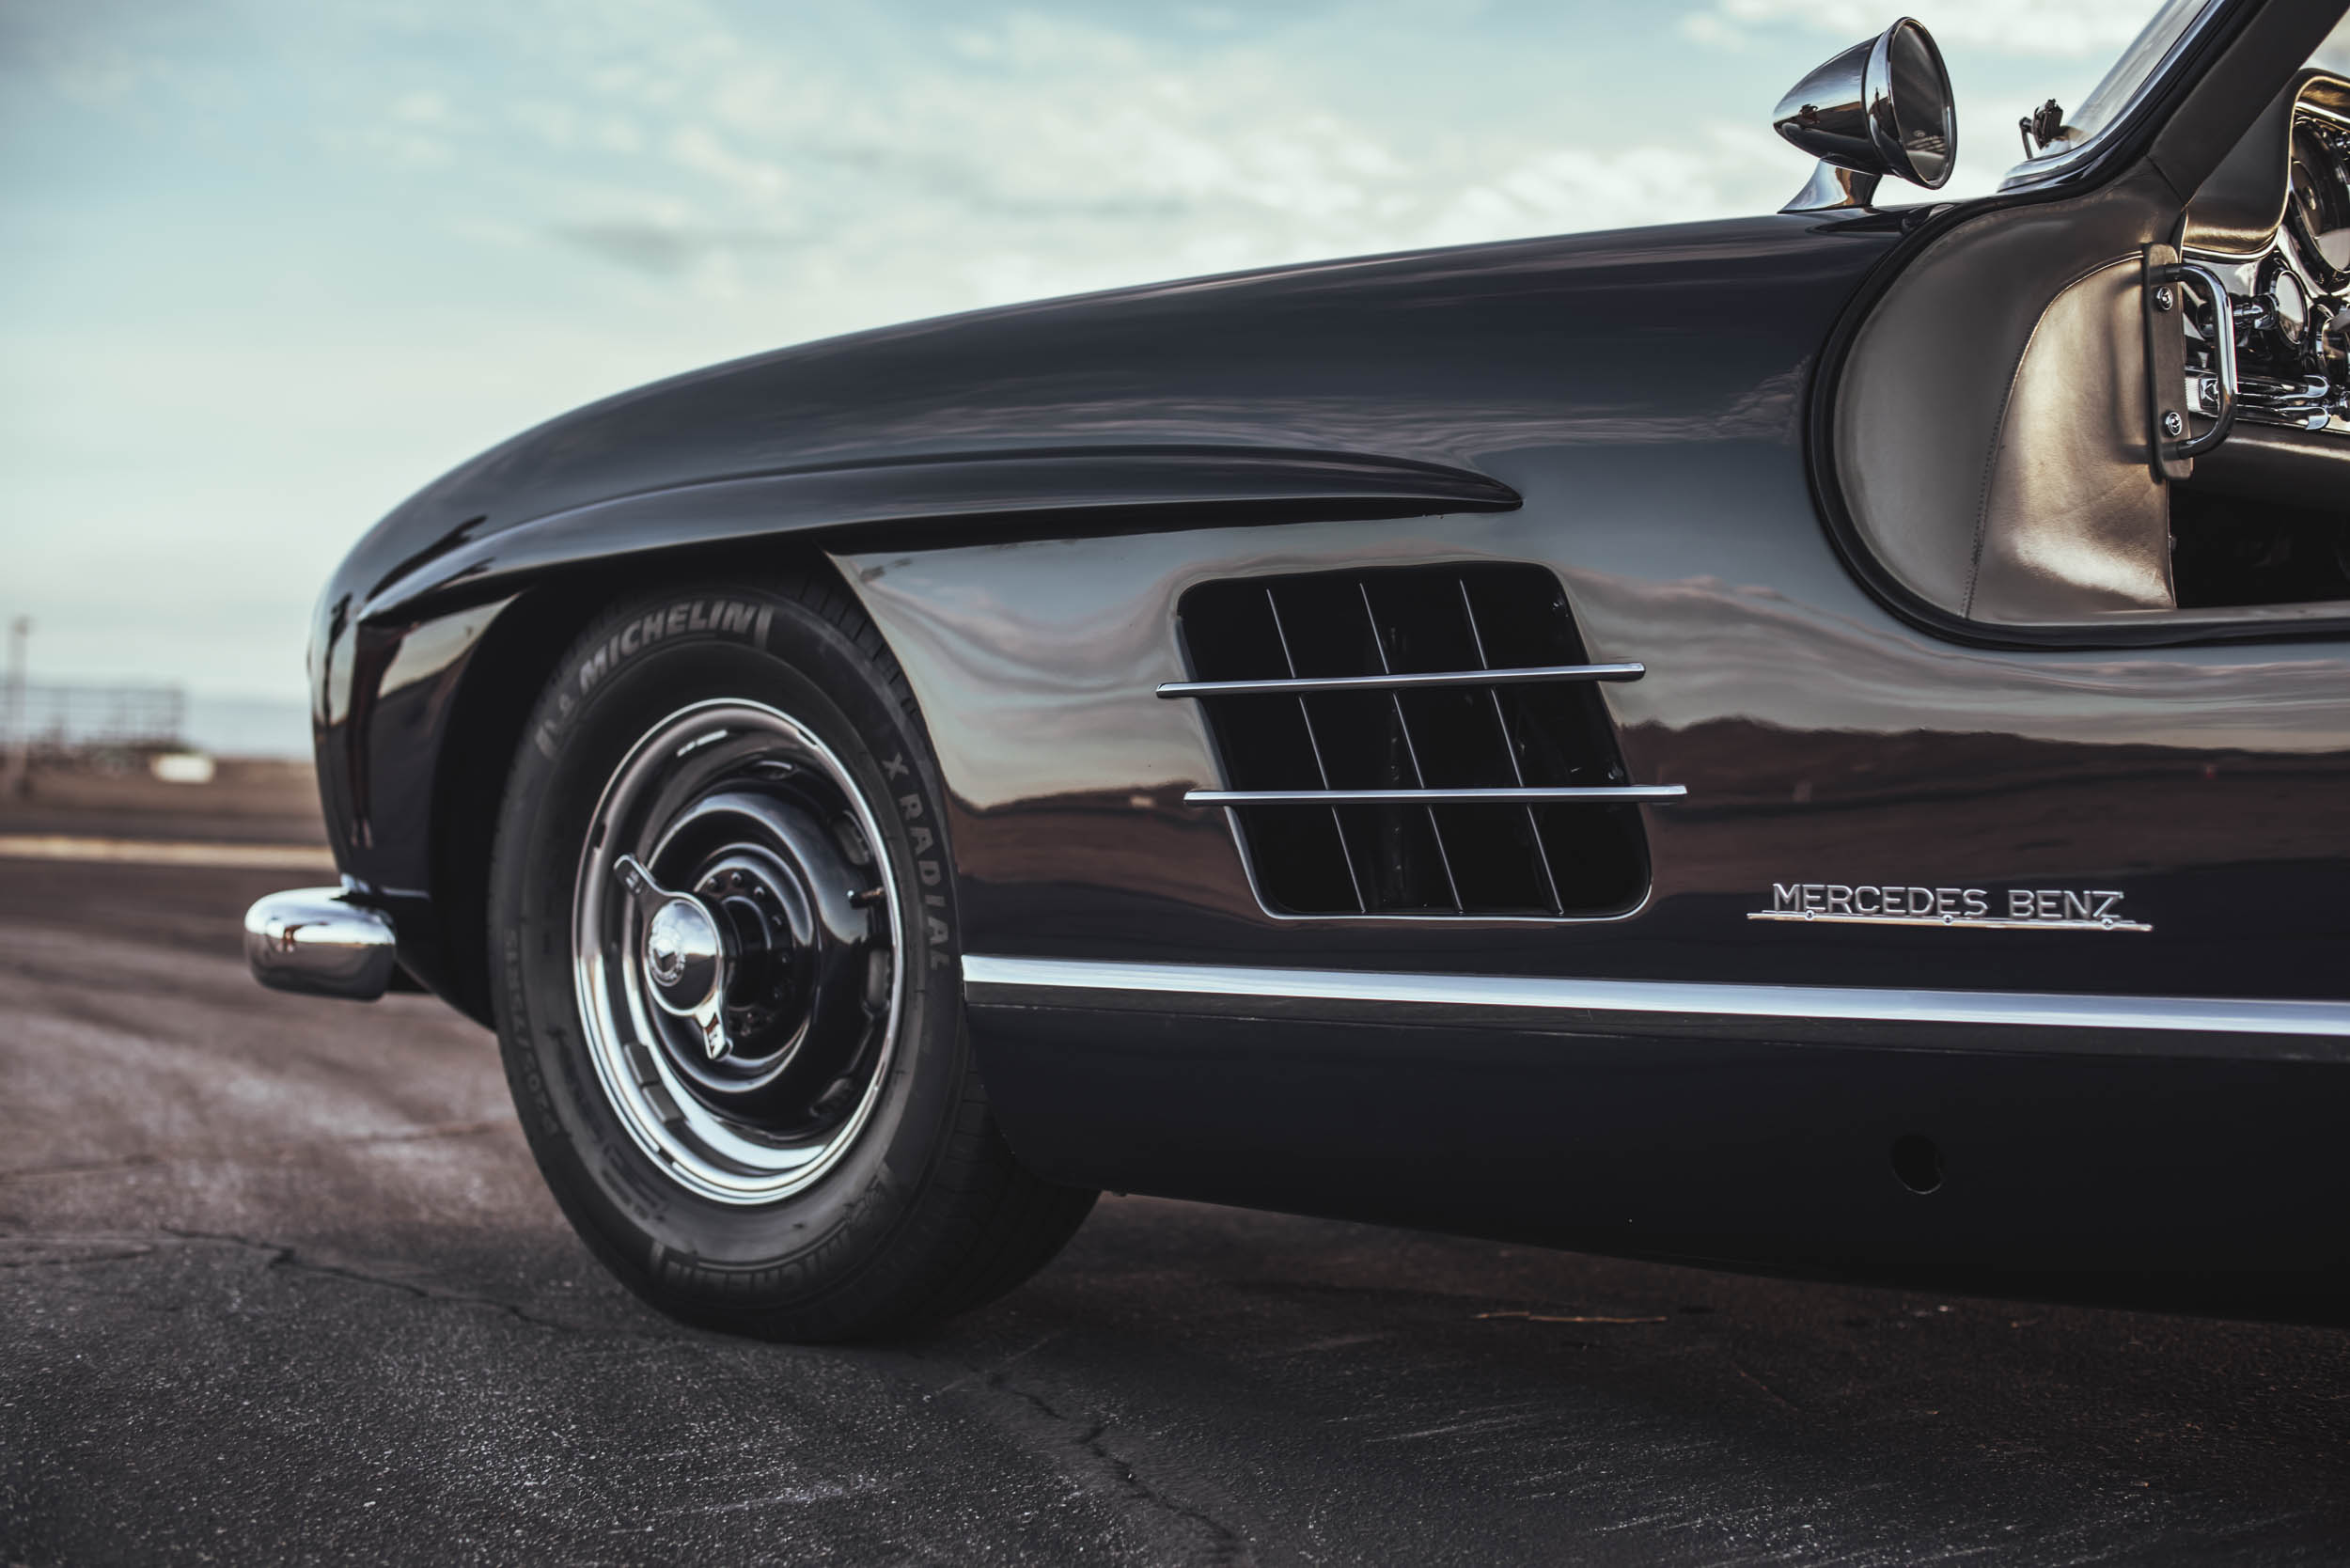 1955 Mercedes-Benz 300 SL Gullwing side vents